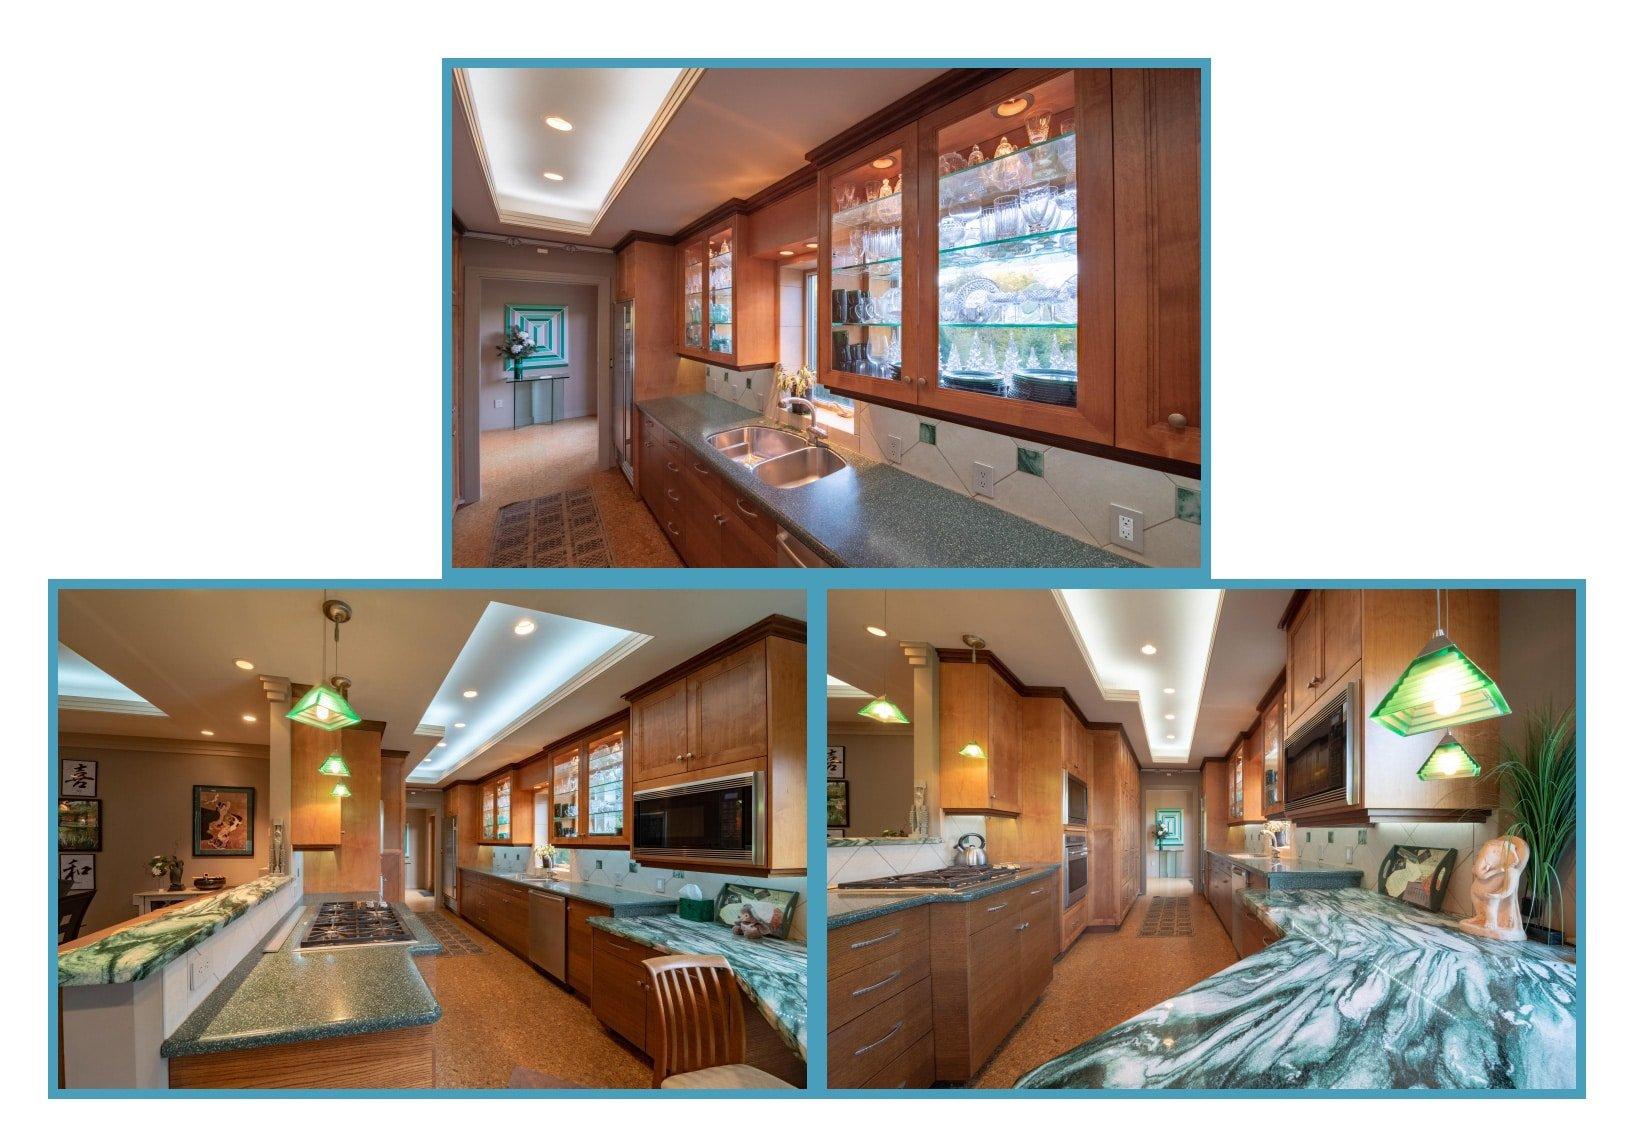 New Retro-Modern Kitchen Plus Dining Room 1